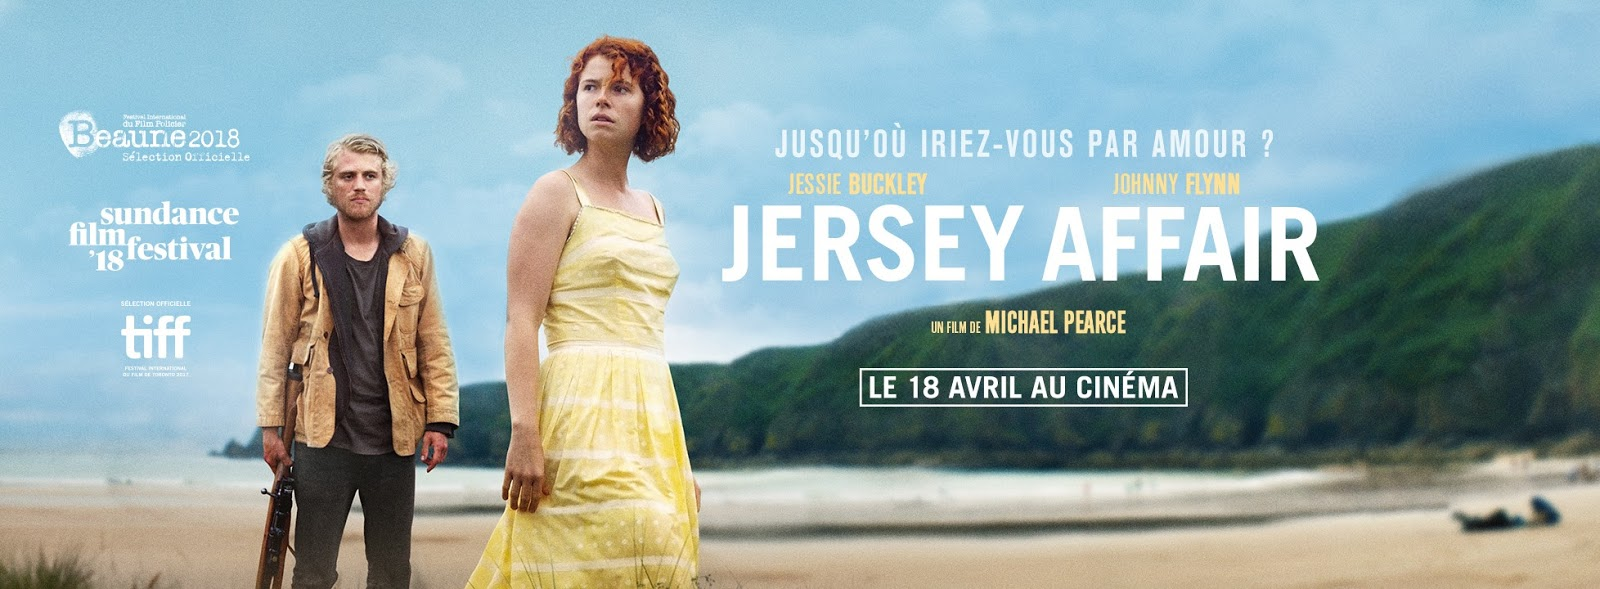 Jersey Affair (Beast) de Michael Pearce, avec Jessie Buckley et Johnny Flynn Jersey-affair-affiche-mini